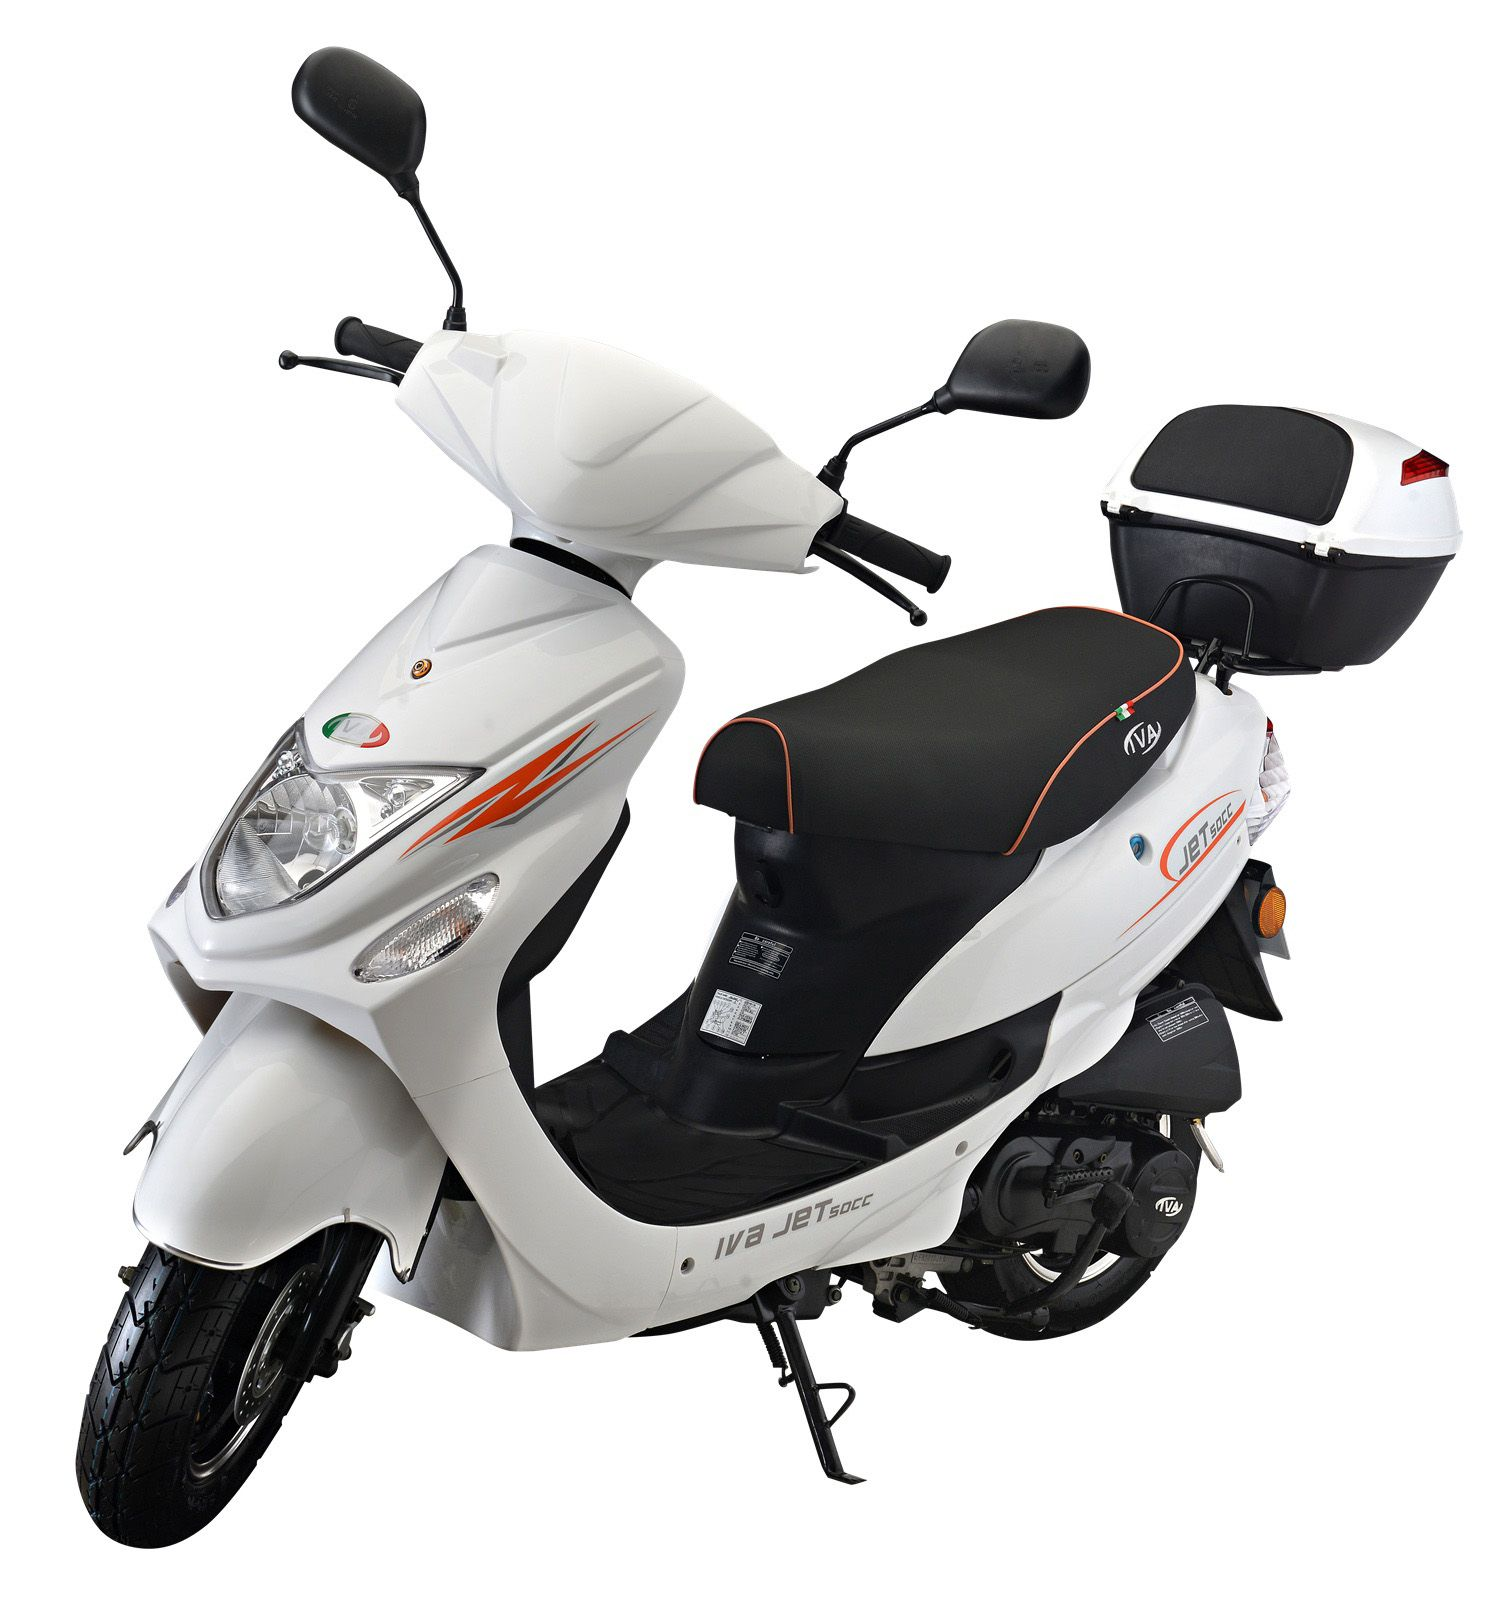 IVA Mofaroller inkl. Topcase, 49 ccm, 25 km/h, weiß,  Jet New  Preisvergleich